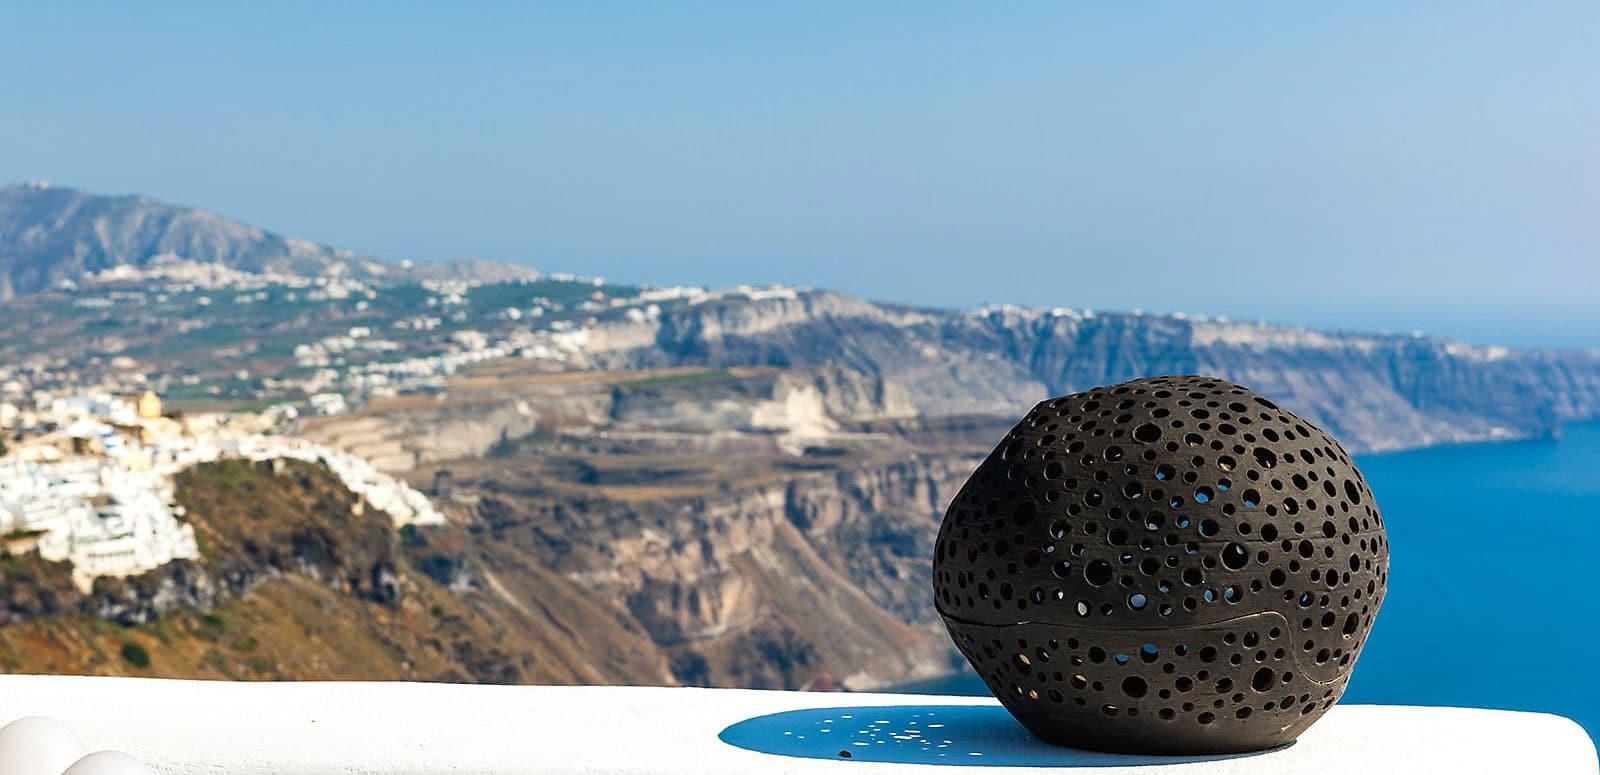 santorini luxury villa outdoor pool view caldera 1600